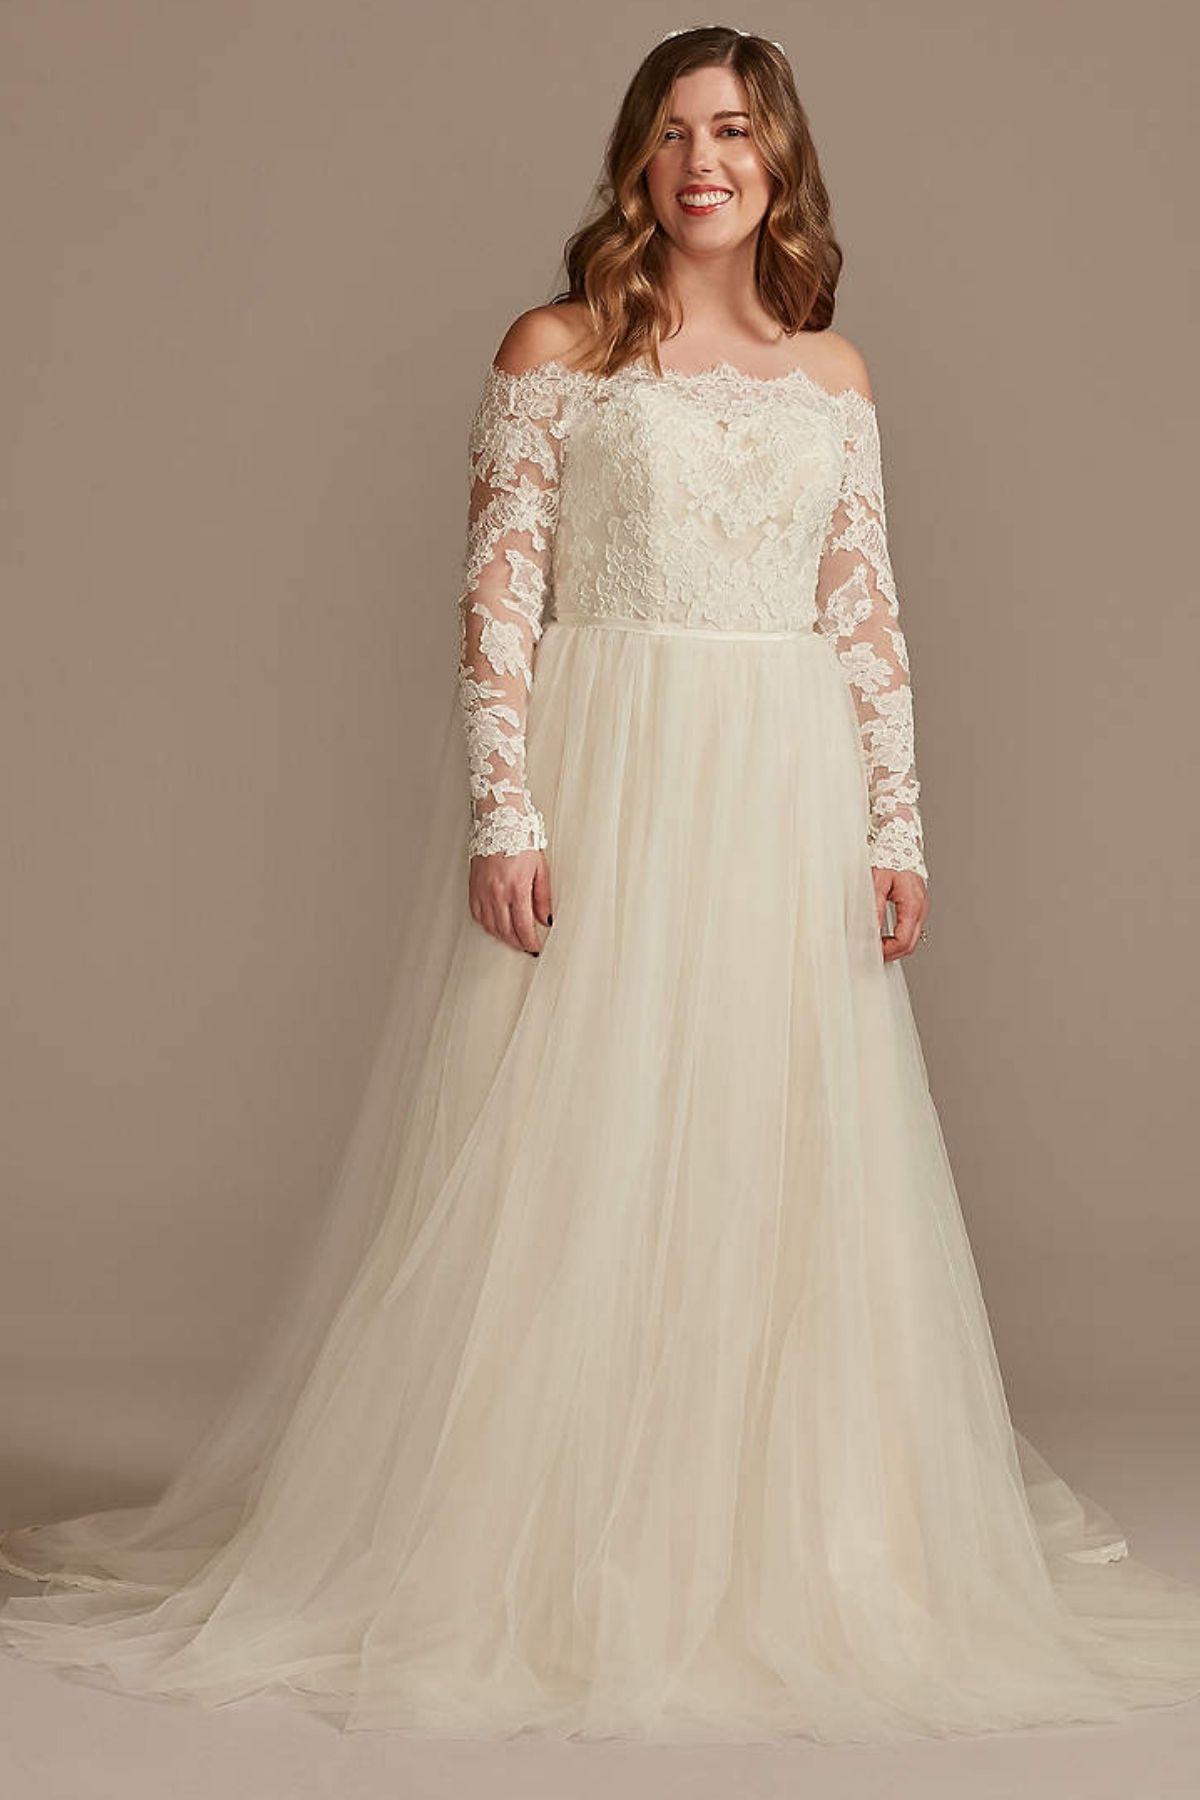 5. Lace Applique Off Shoulder Tall Wedding Dress